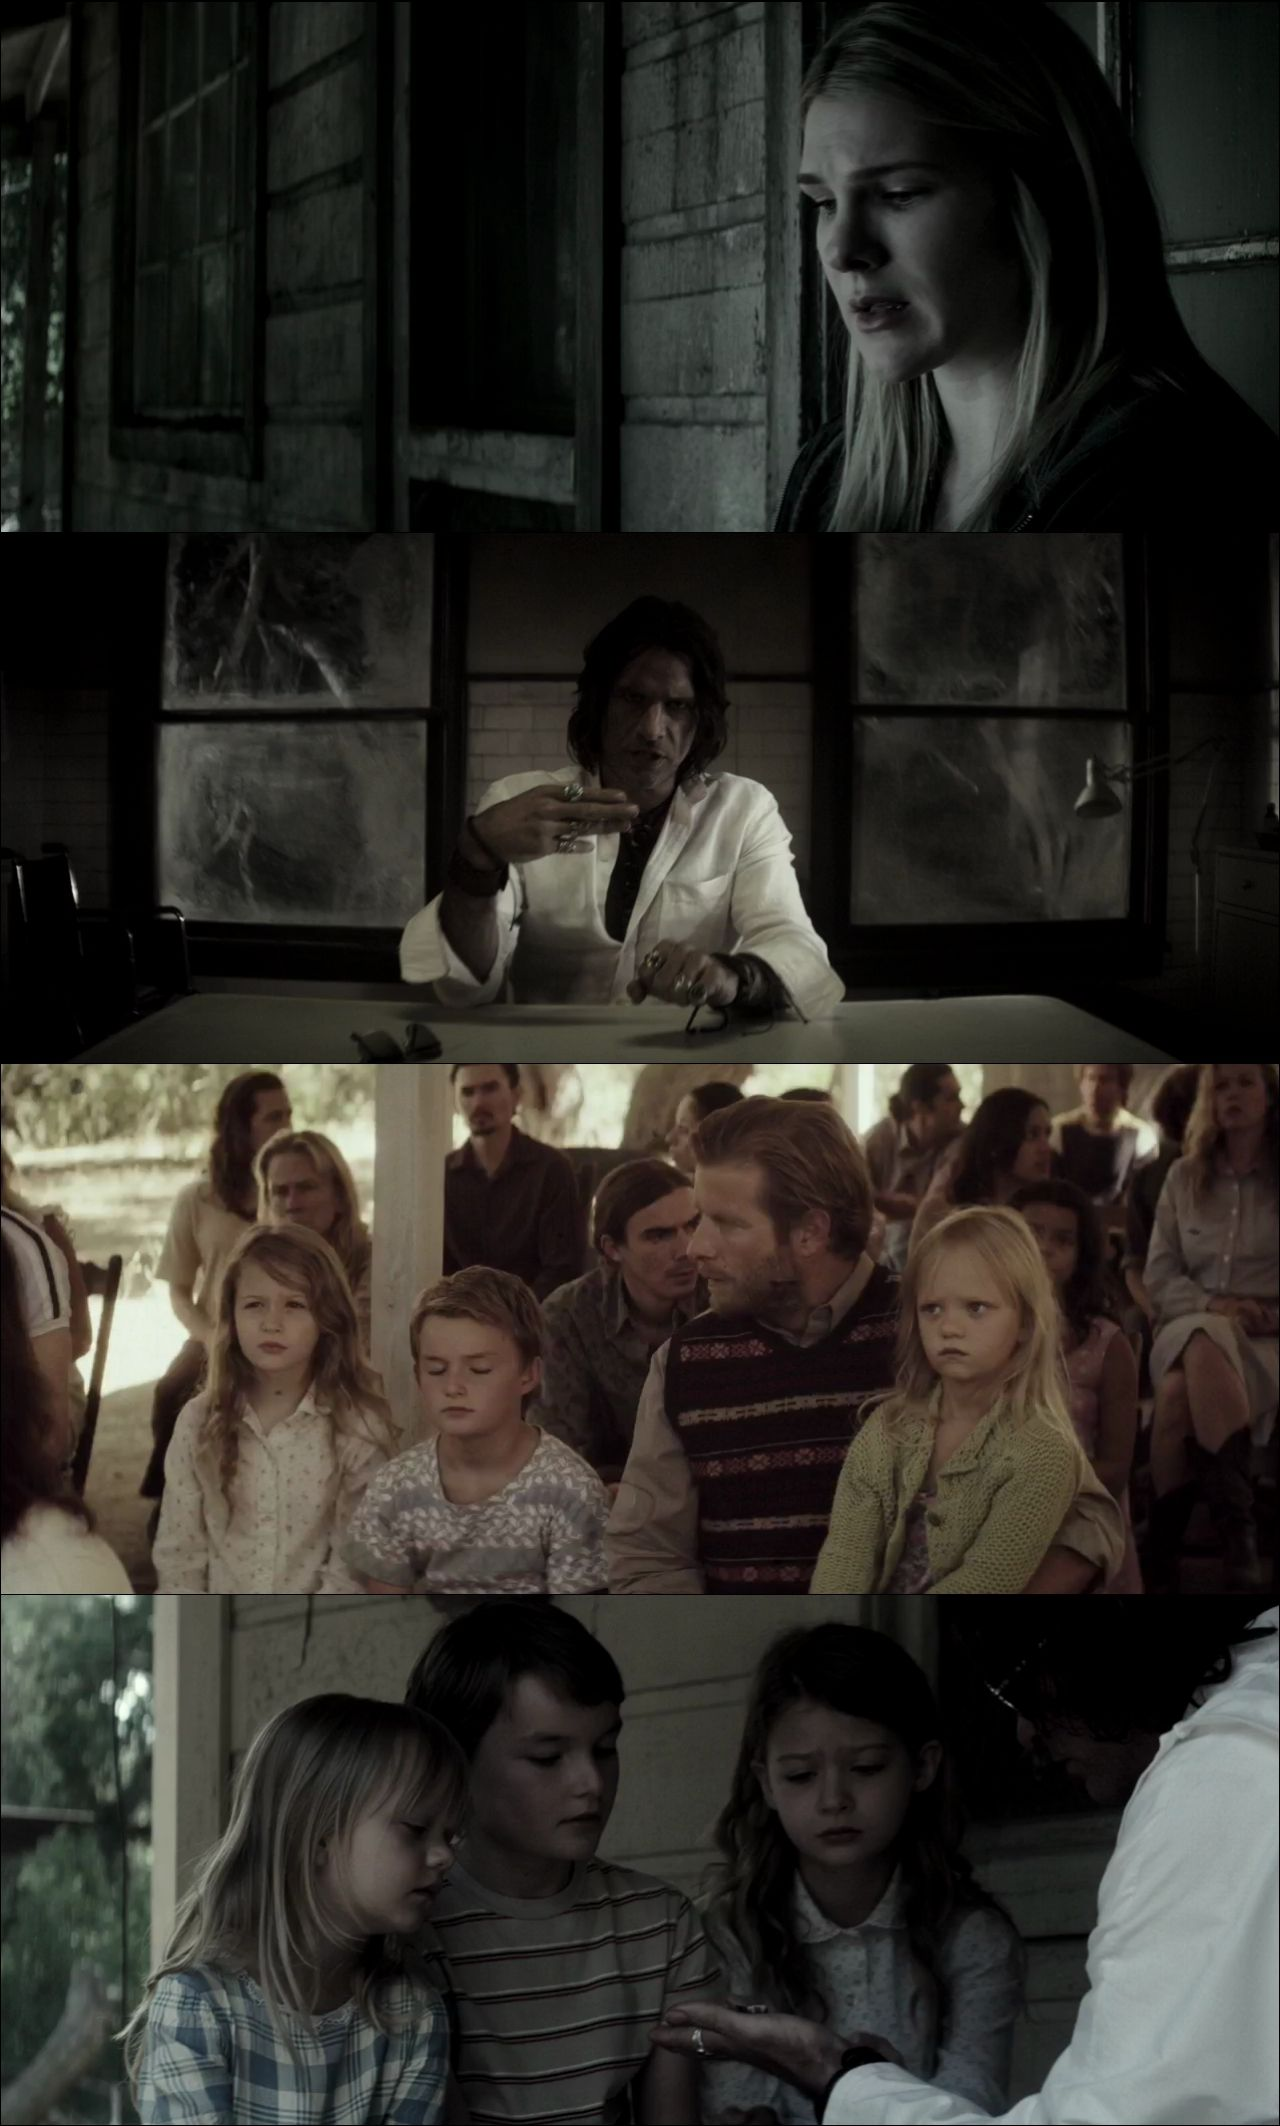 Perde - The Veil (2016) full türkçe dublaj film indir